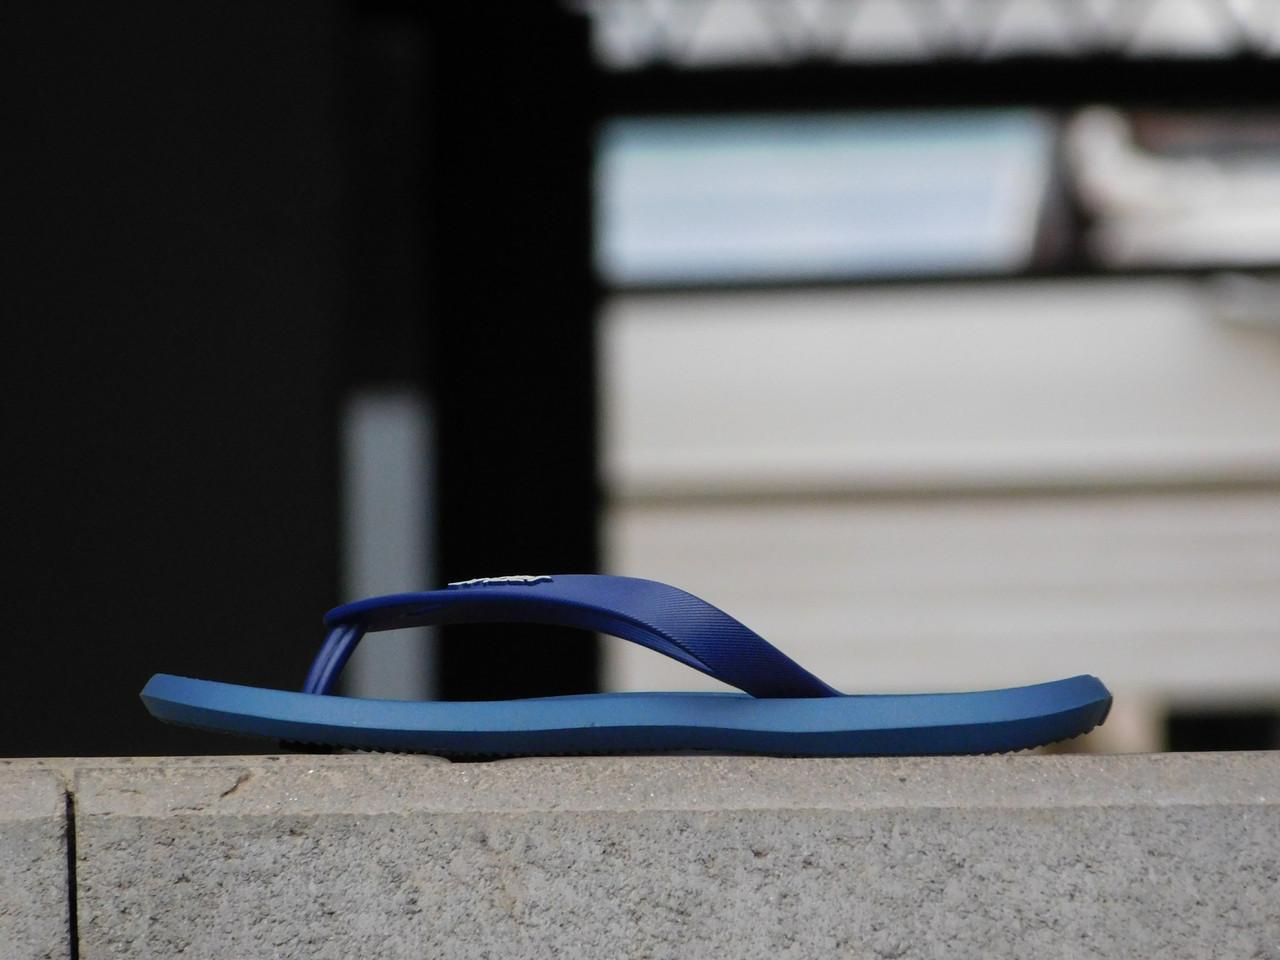 Шлепанцы Rider 10594-02915 (лето, мужские, резина, синий)